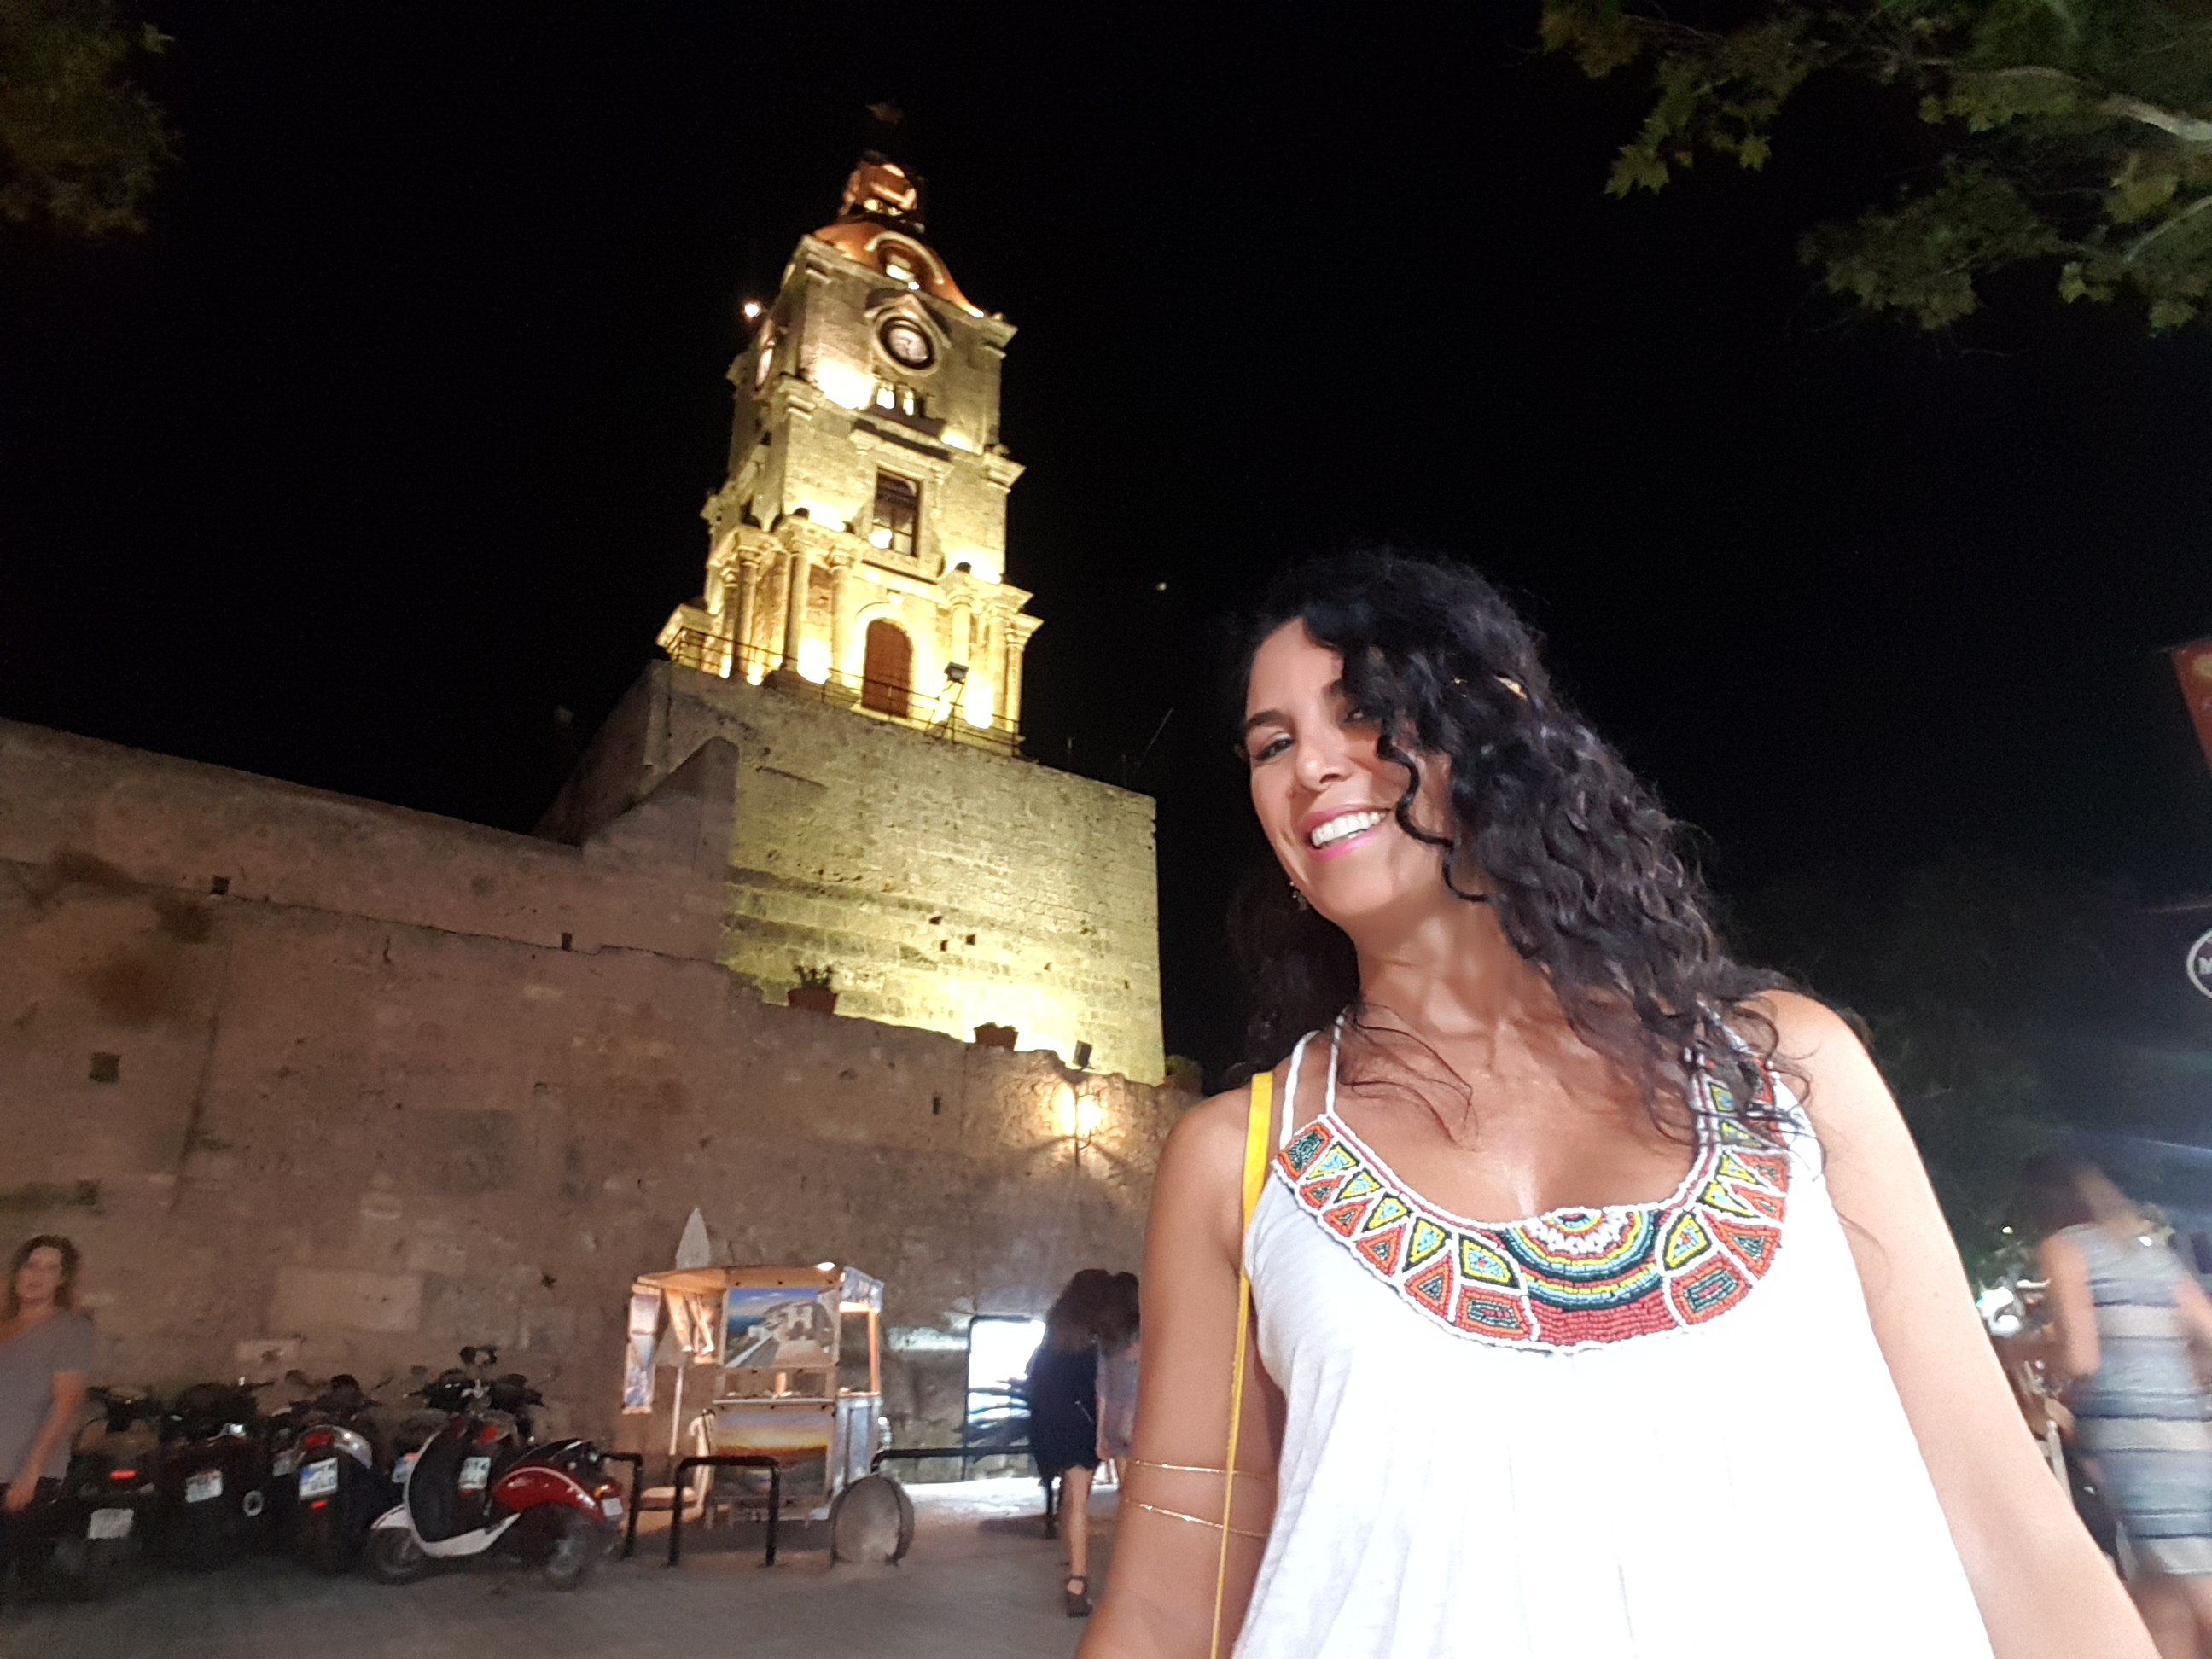 Old Town saat kulesi